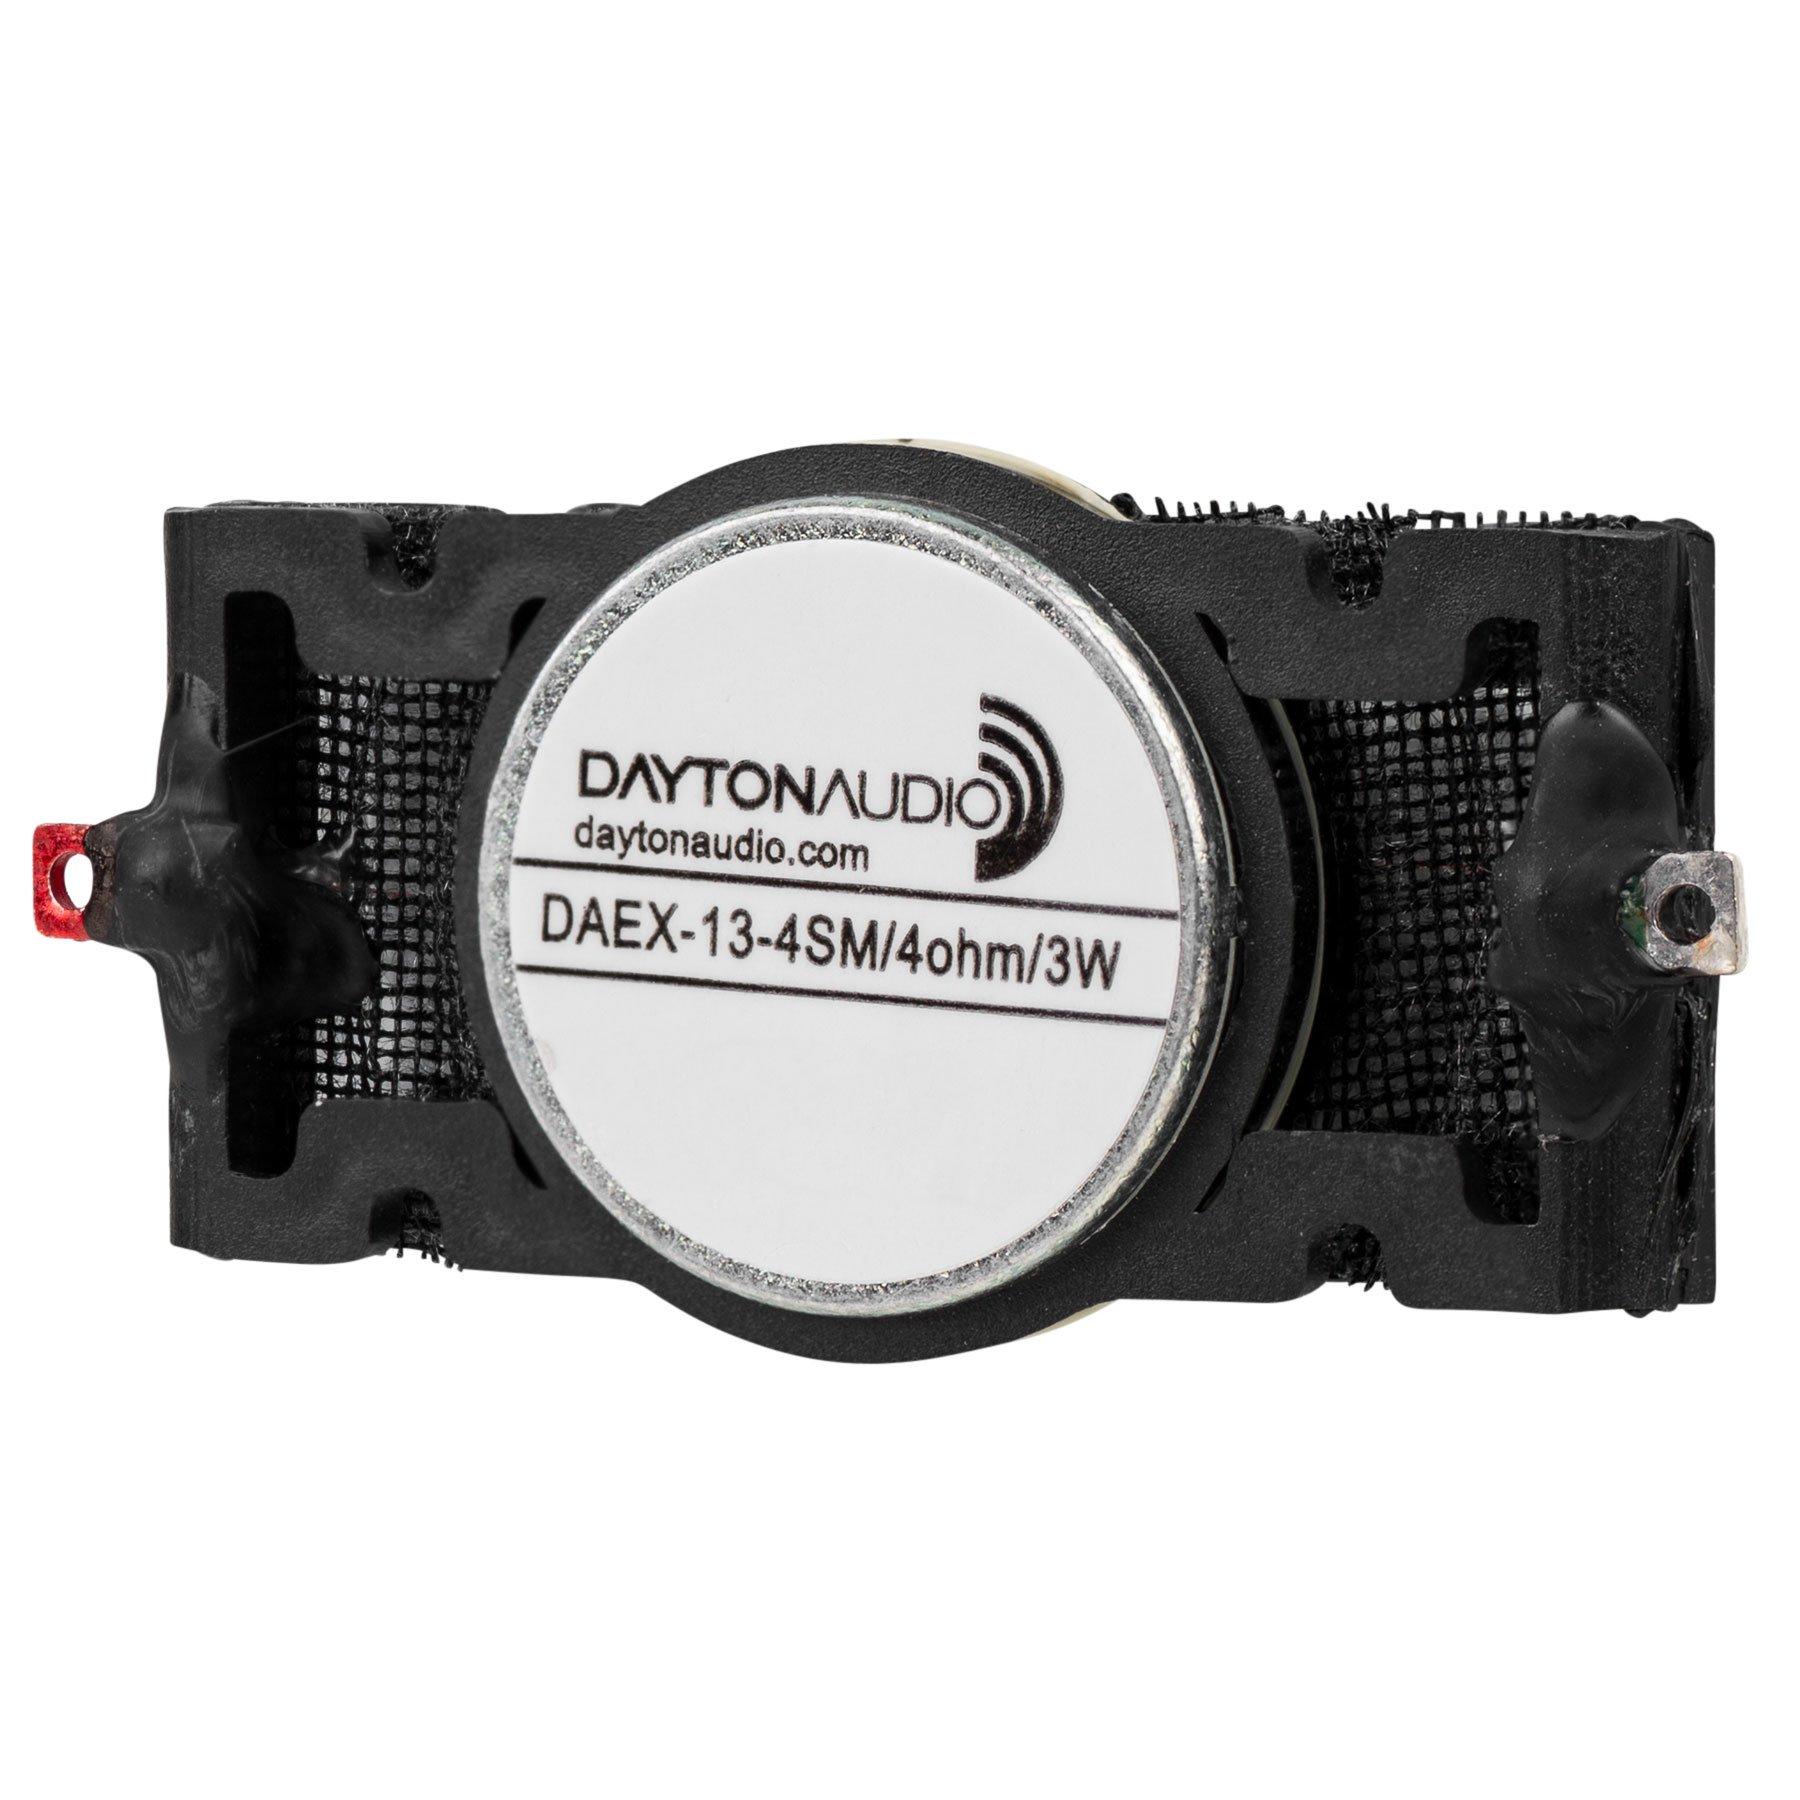 Dayton Audio DAEX-13-4SM Skinny Mini Exciter Audio and Haptic Feedback 13mm 3W 4 Ohm